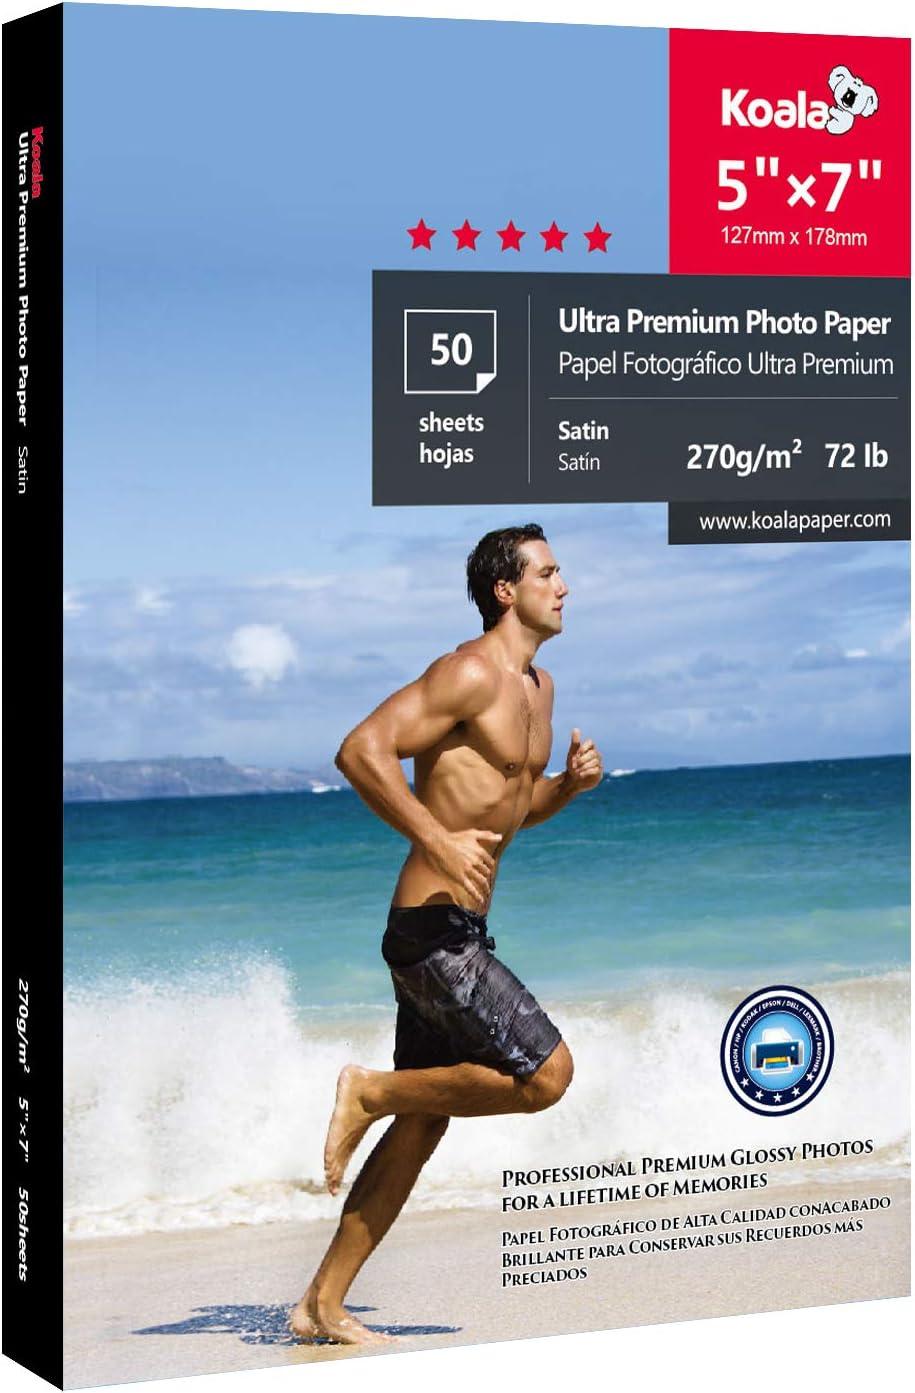 Koala Ultra Premium Photo Paper Satin 5x7 Inch Heavyweight 72lb for Inkjet Printer 50 Sheets